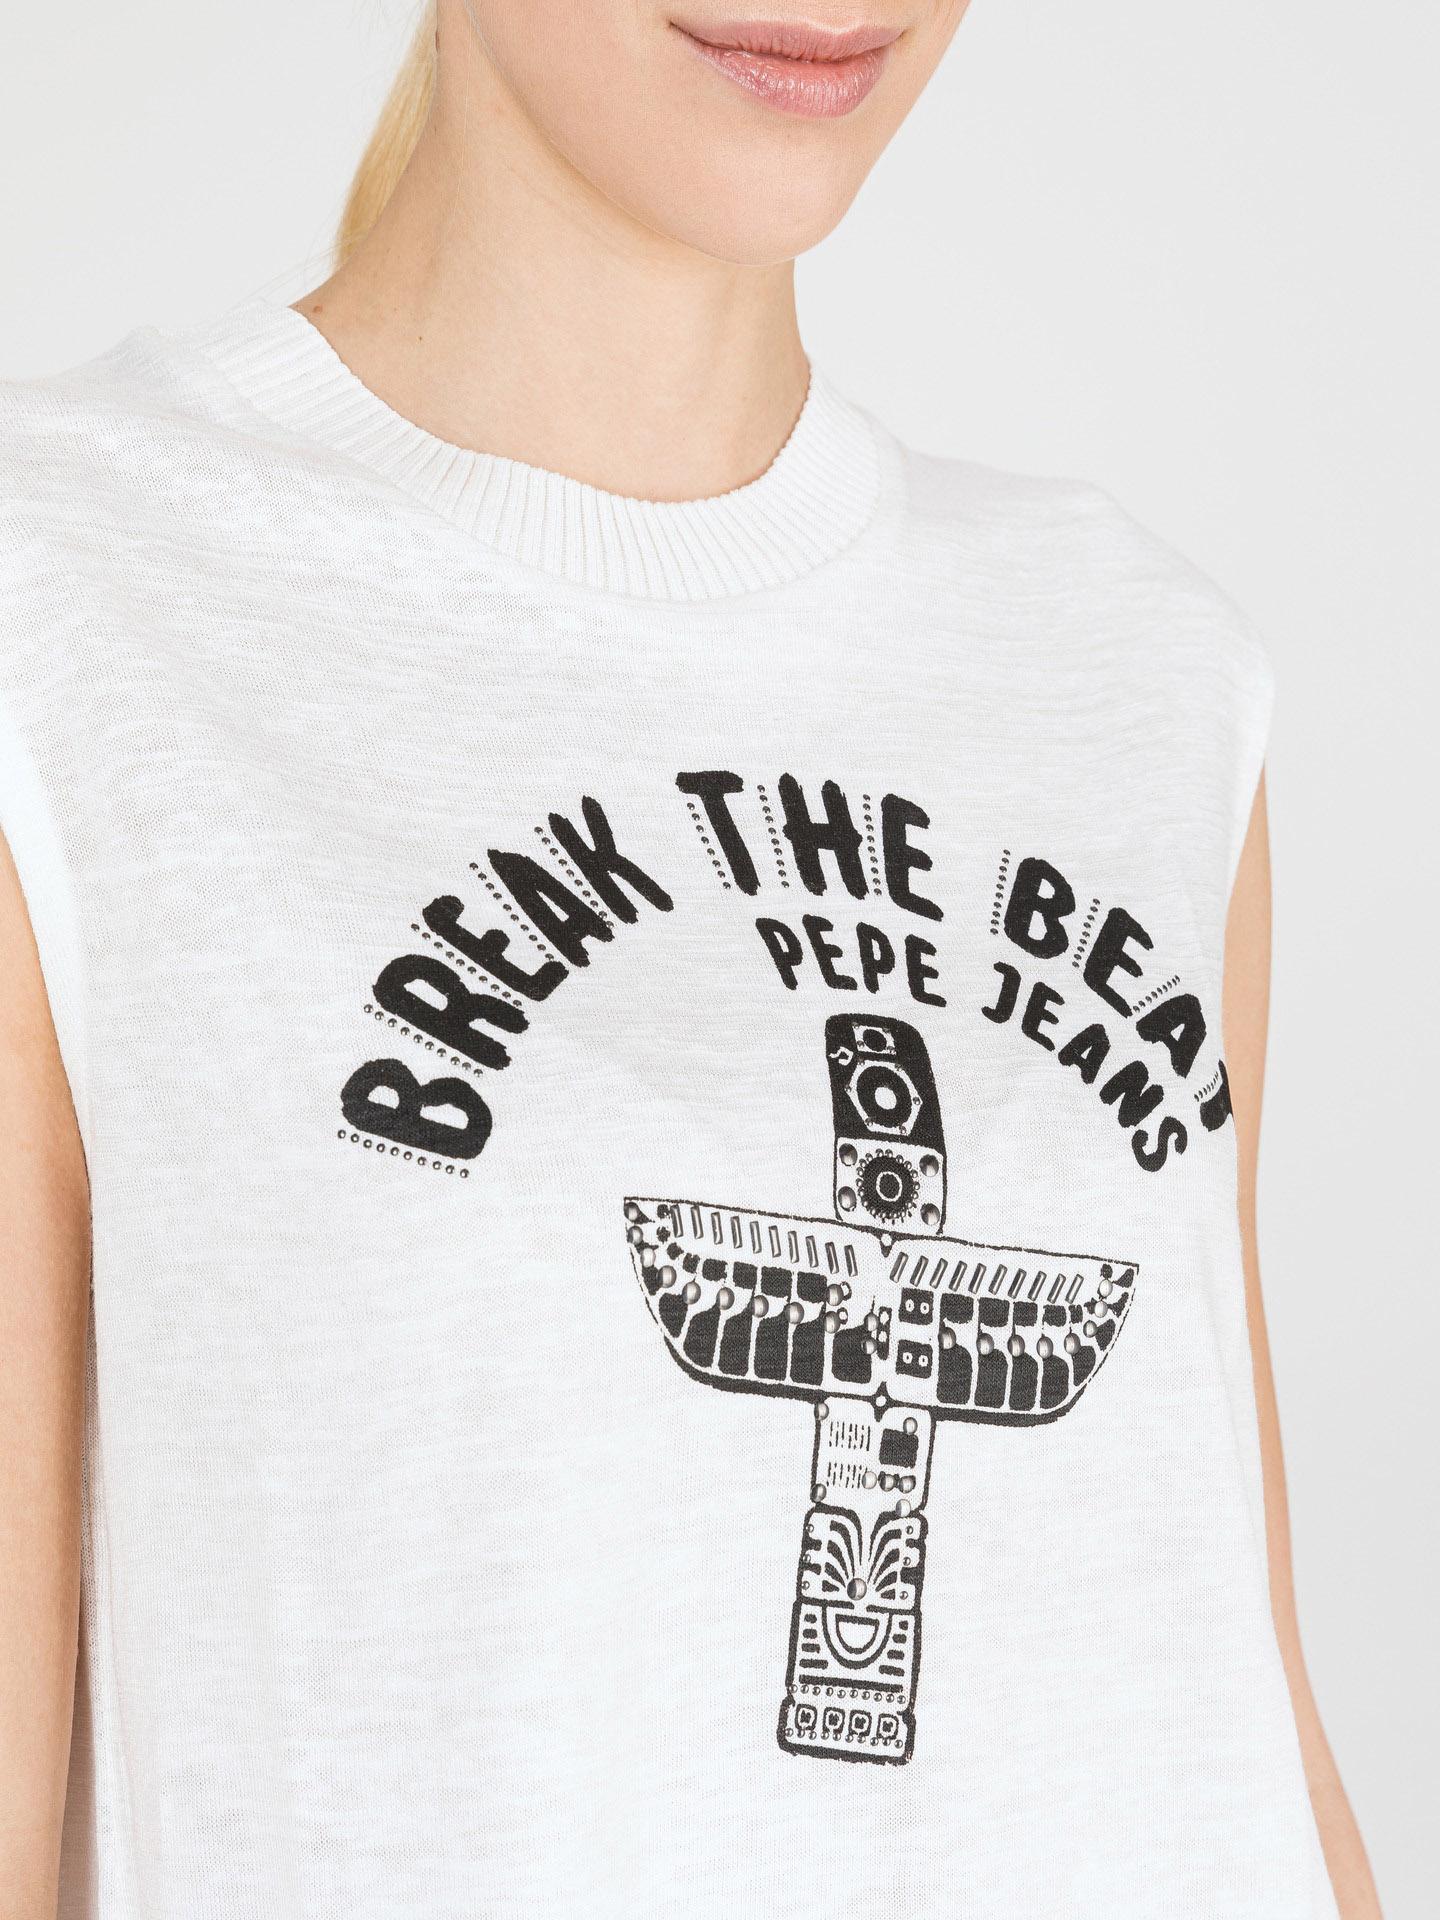 Pepe Jeans Carly Tank Top Biały